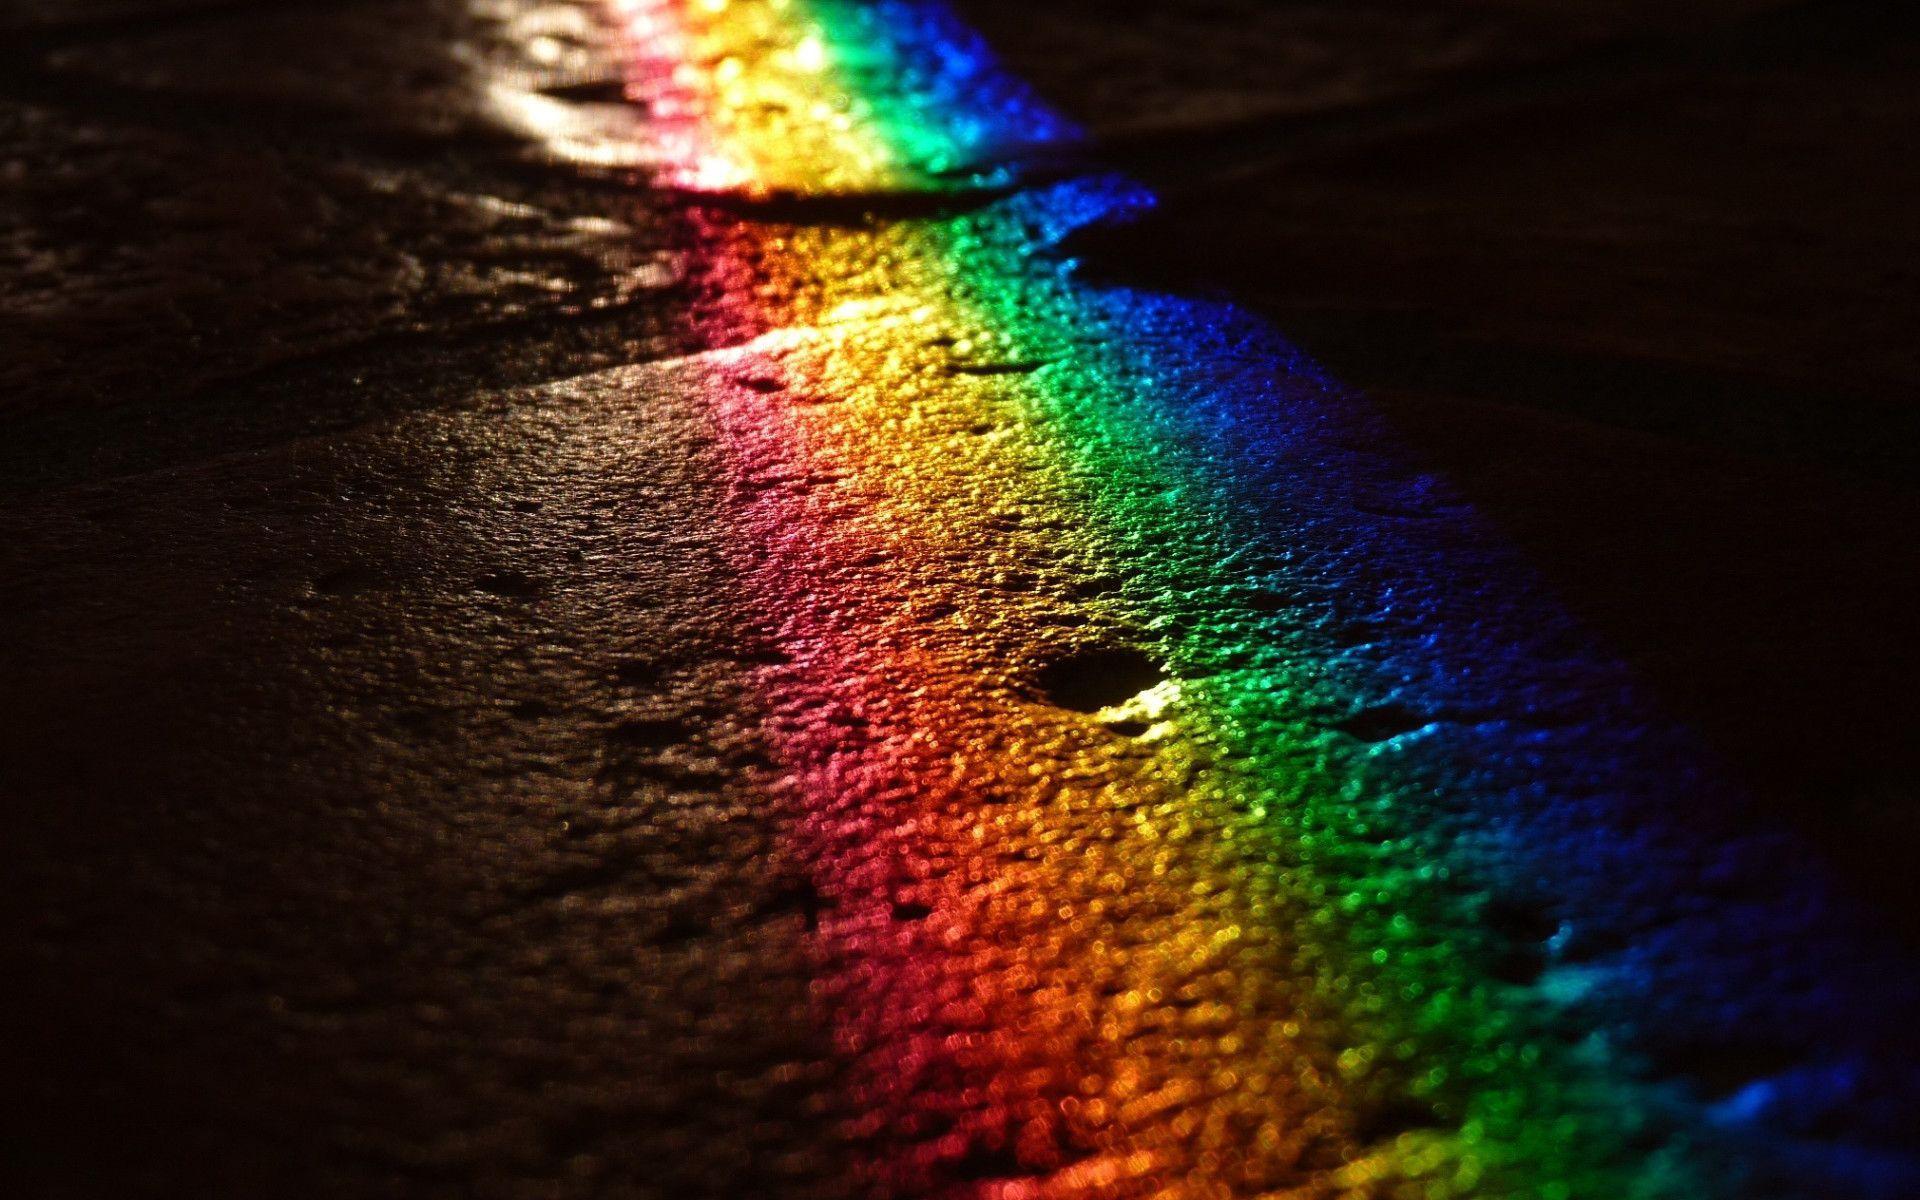 Aesthetic Rainbow Wallpapers - Top Free Aesthetic Rainbow ...